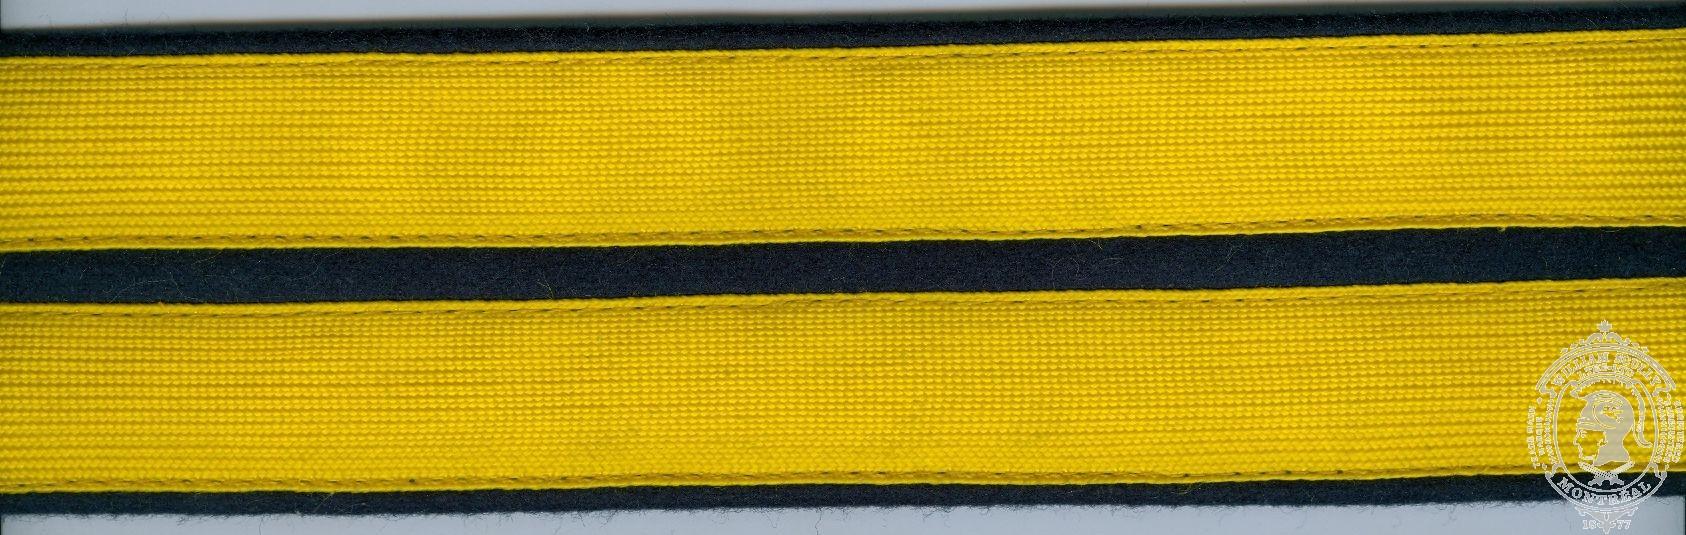 Custom Ceremonial Belt No. 7